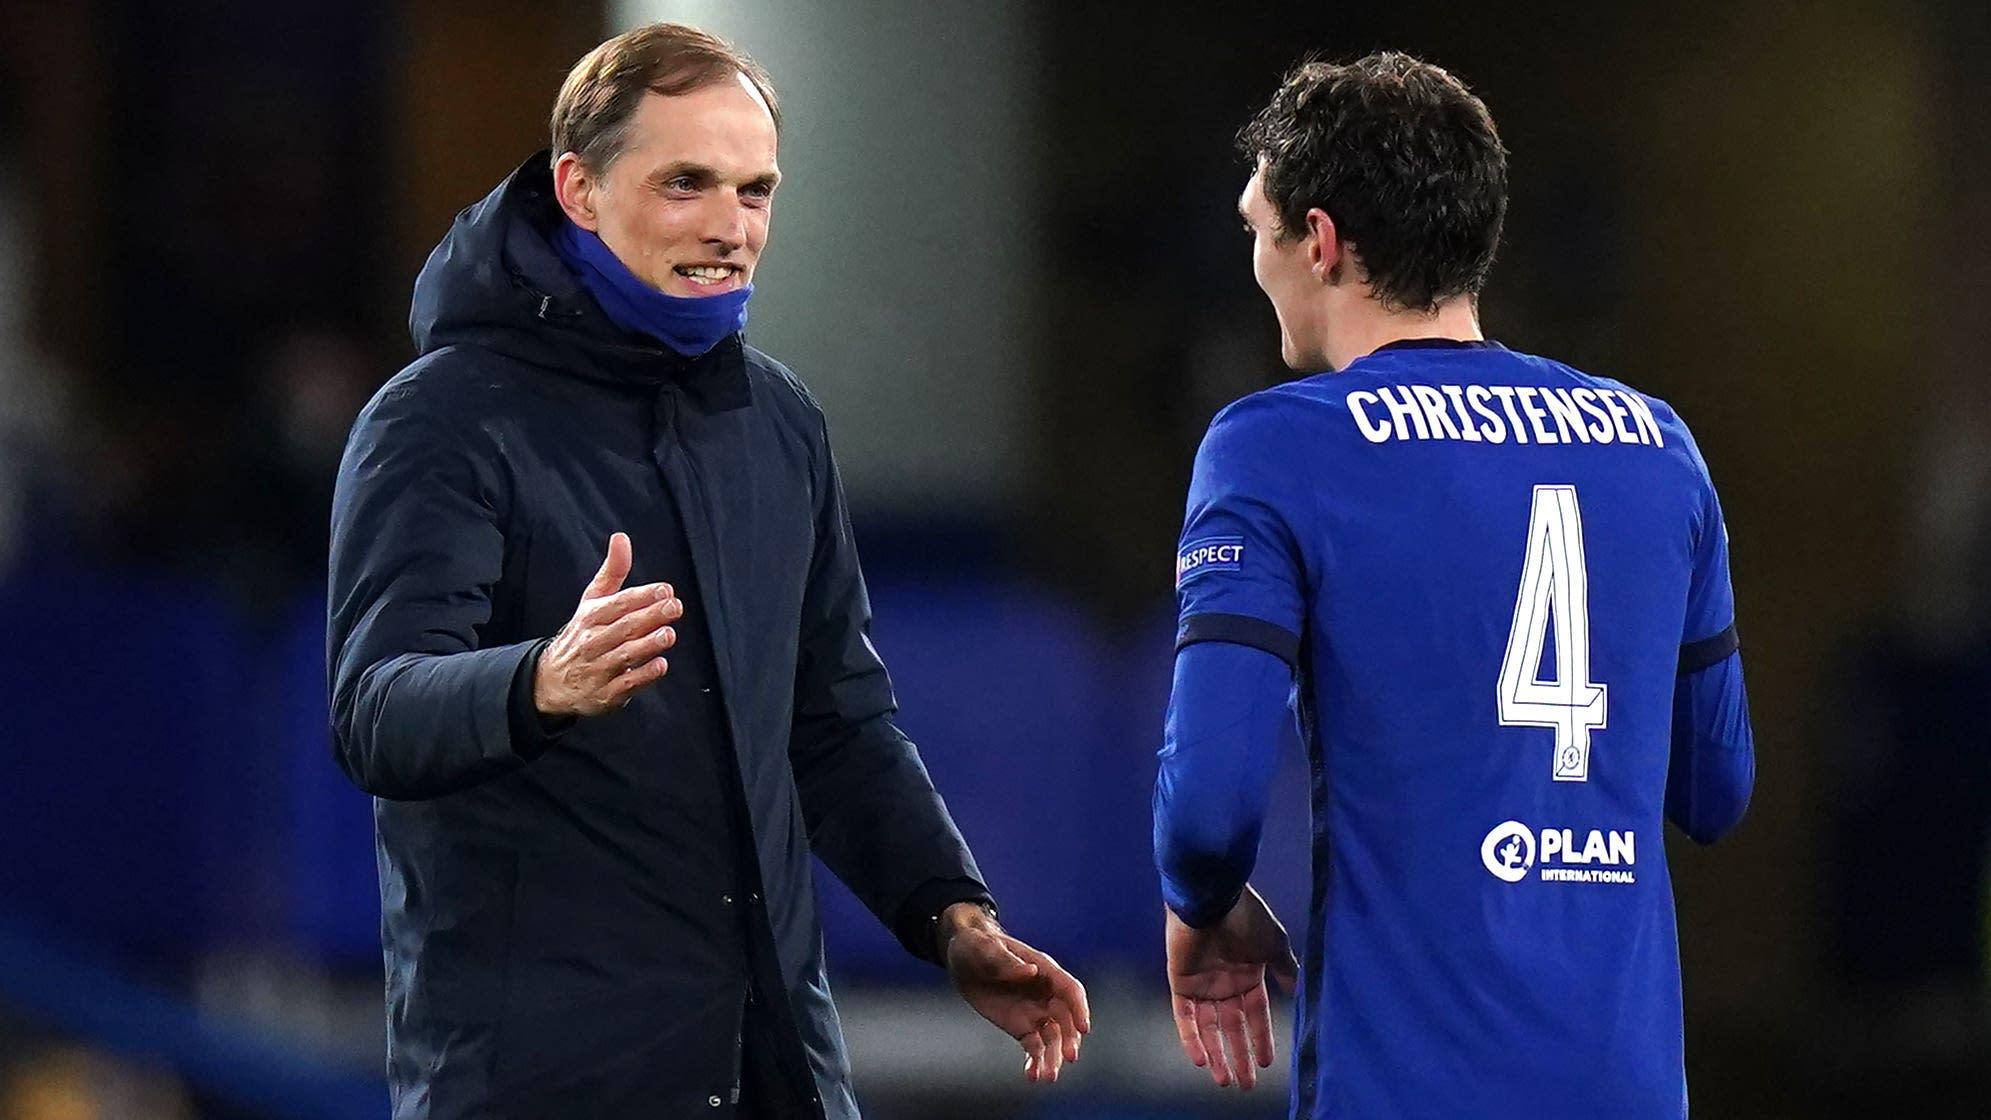 Tuchel celebra con Christensen el pase a la final de la Champions League.